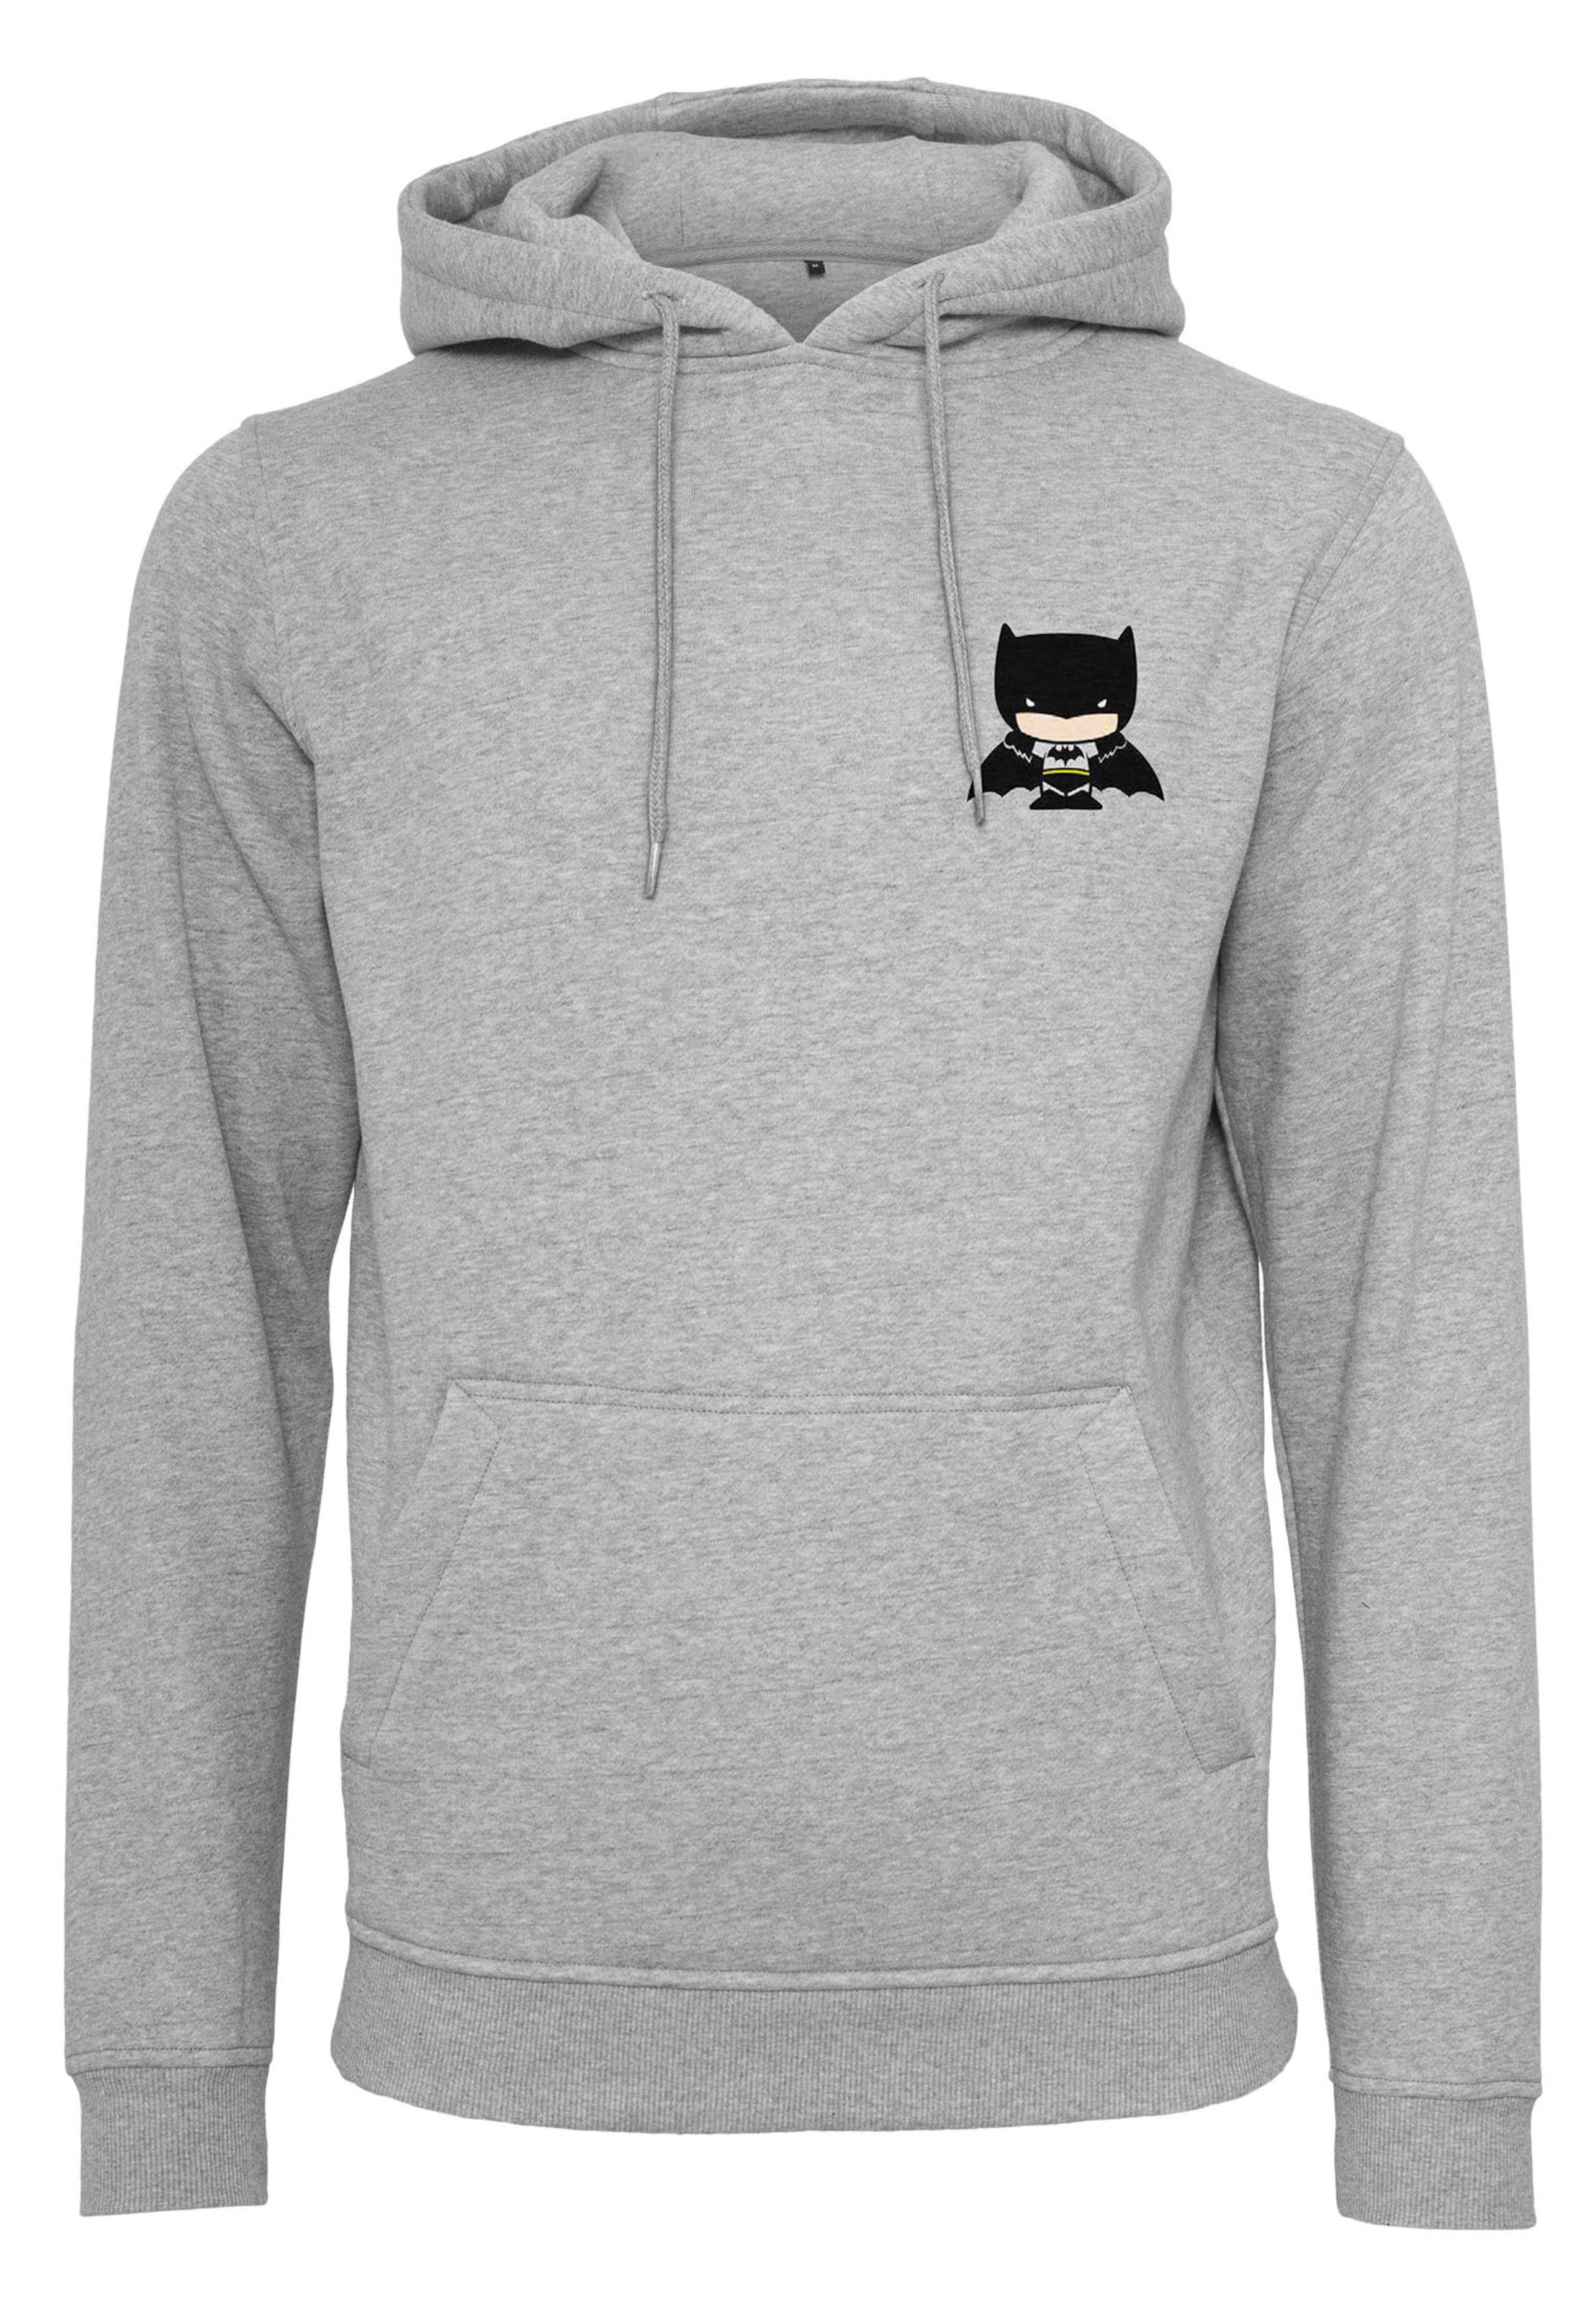 'batman Comic' Mister In GraumeliertSchwarz Hoody Tee byfg67